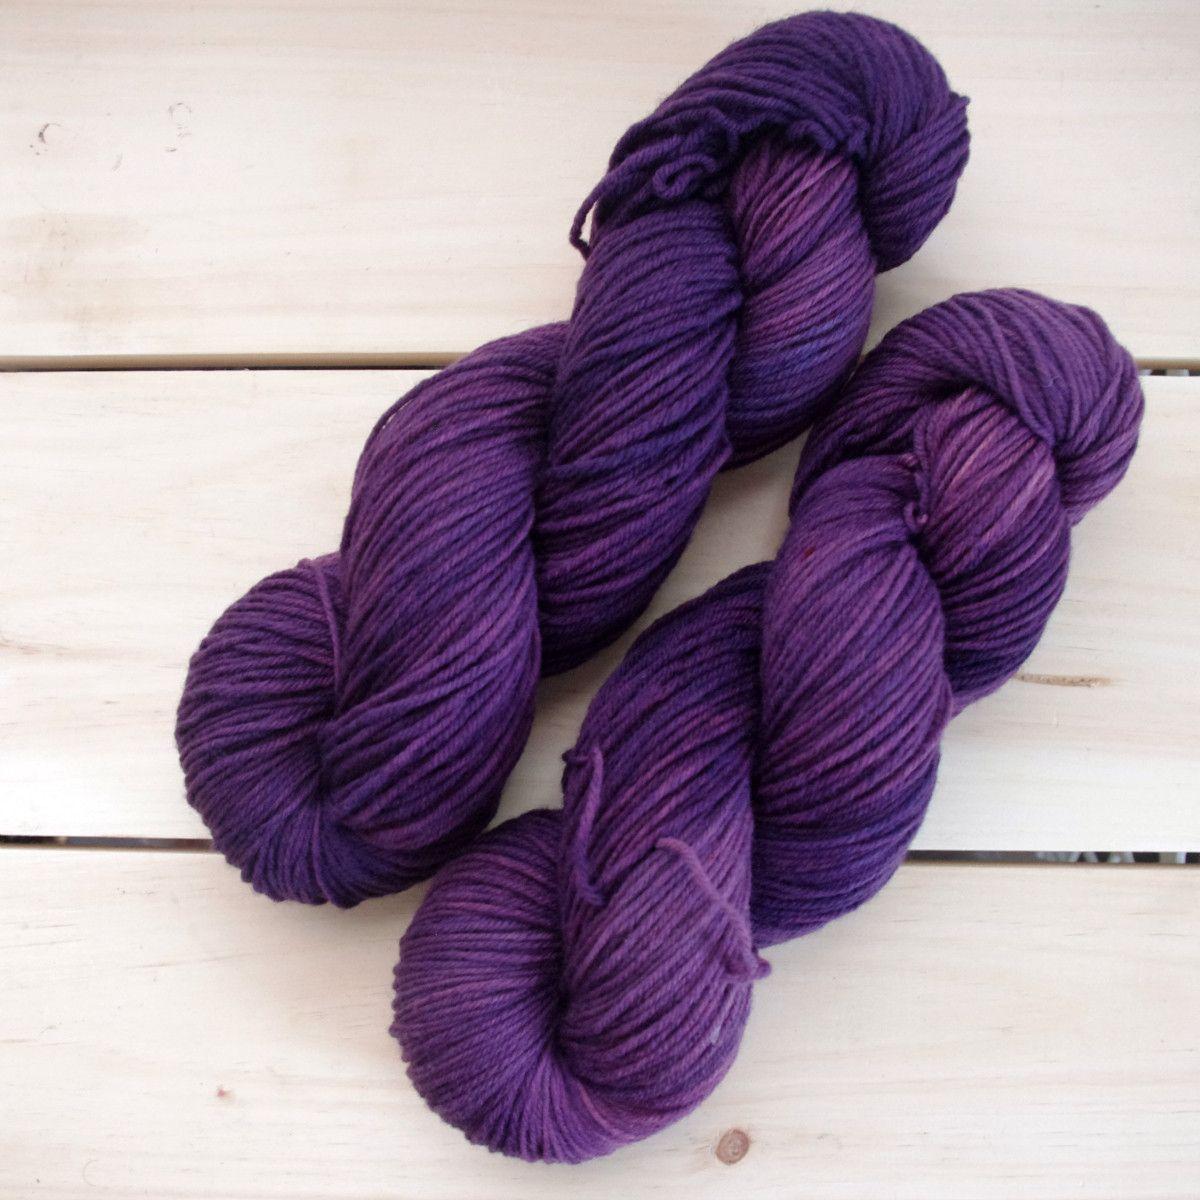 Signature Sock Yarn - Amethyst